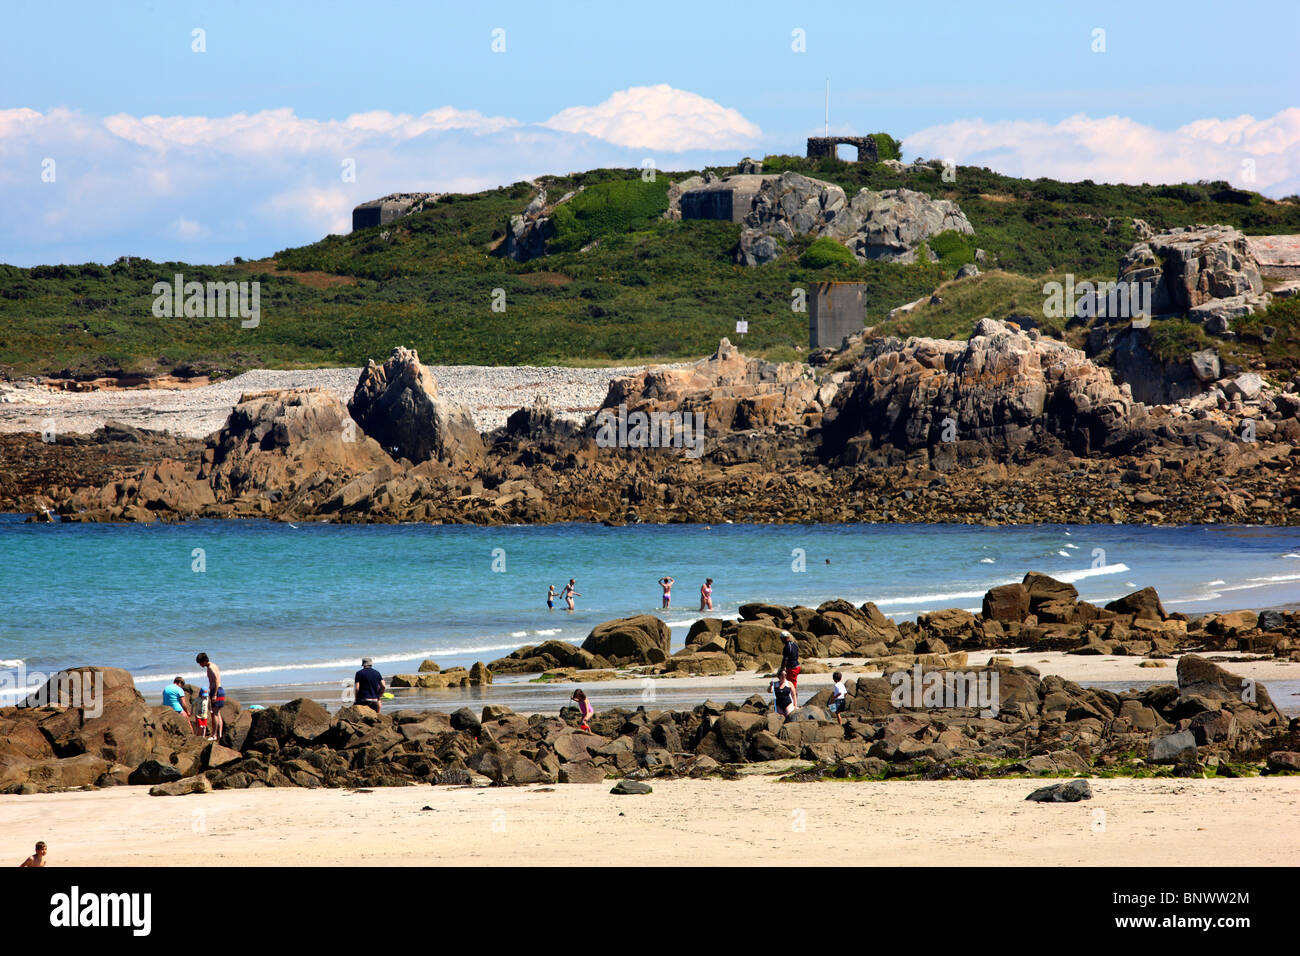 Rough coastline, rocks, north coast of Guernsey, Channel Islands, UK, Europe Stock Photo